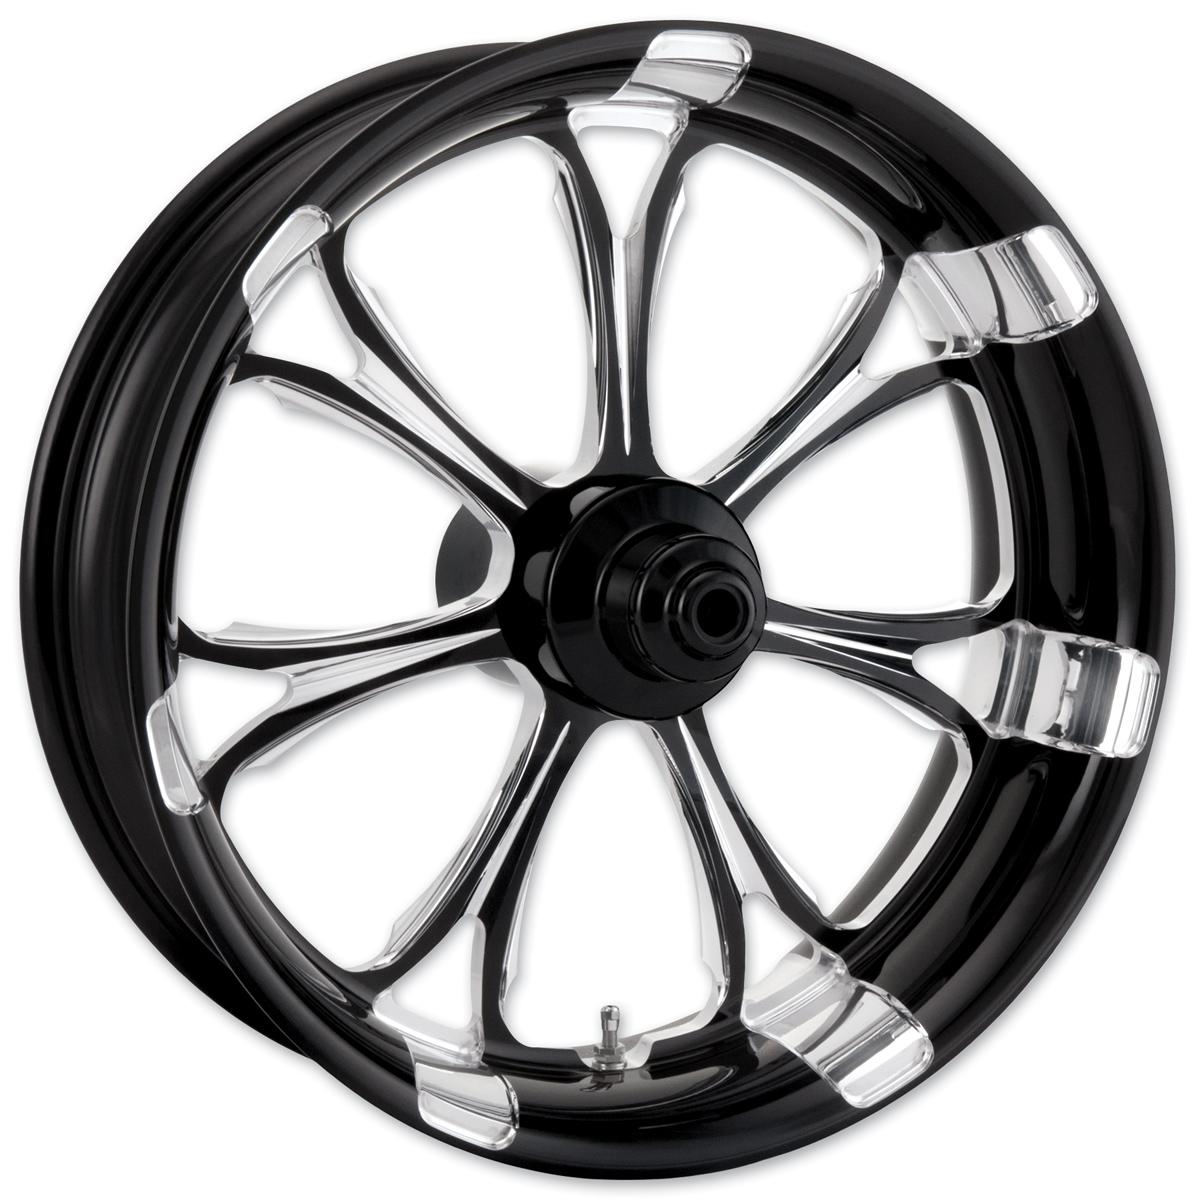 Performance Machine Paramount Platinum Cut Front Wheel 23x3.5 ABS